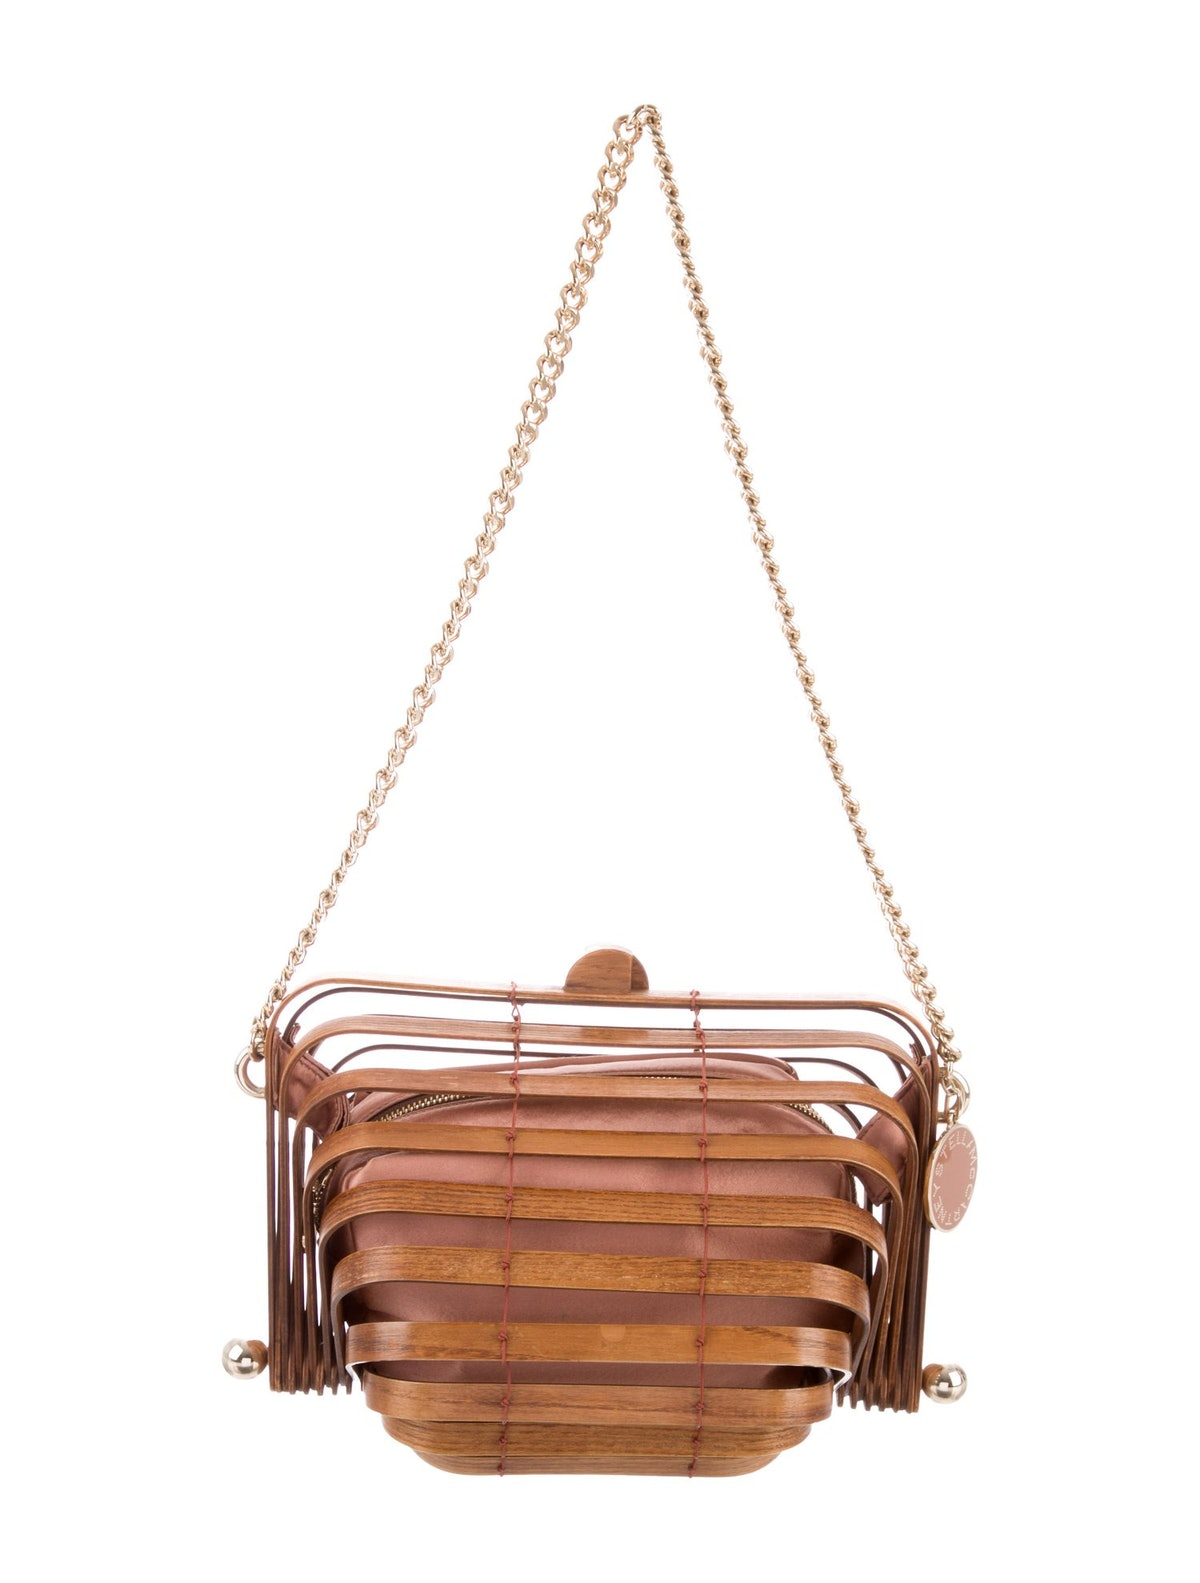 Stella McCartney Wooden Accordion Bag